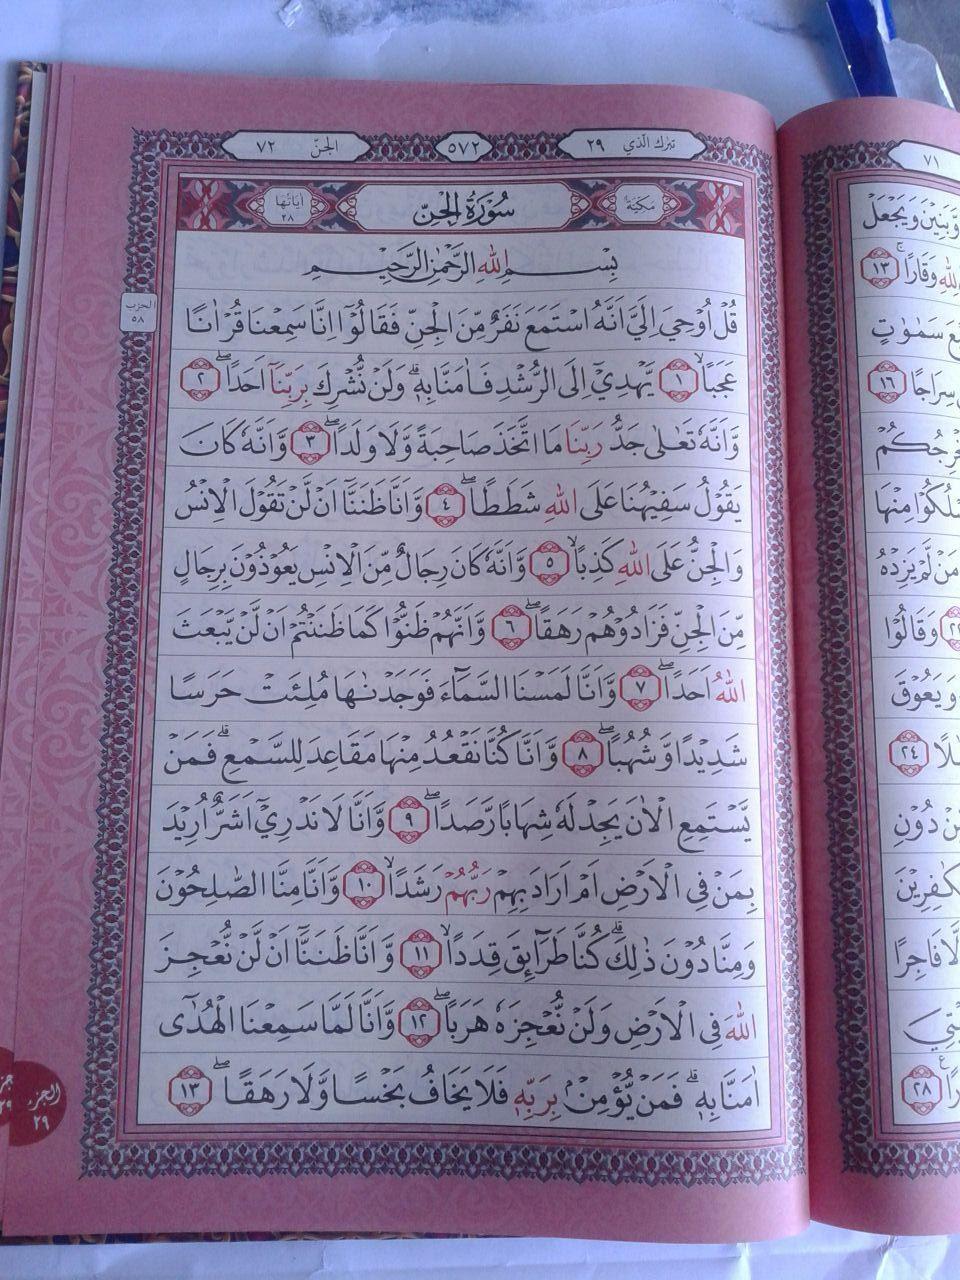 Al-Qur'an Mushaf Samsia 15 Baris Khot Utsmani Ukuran Jumbo isi